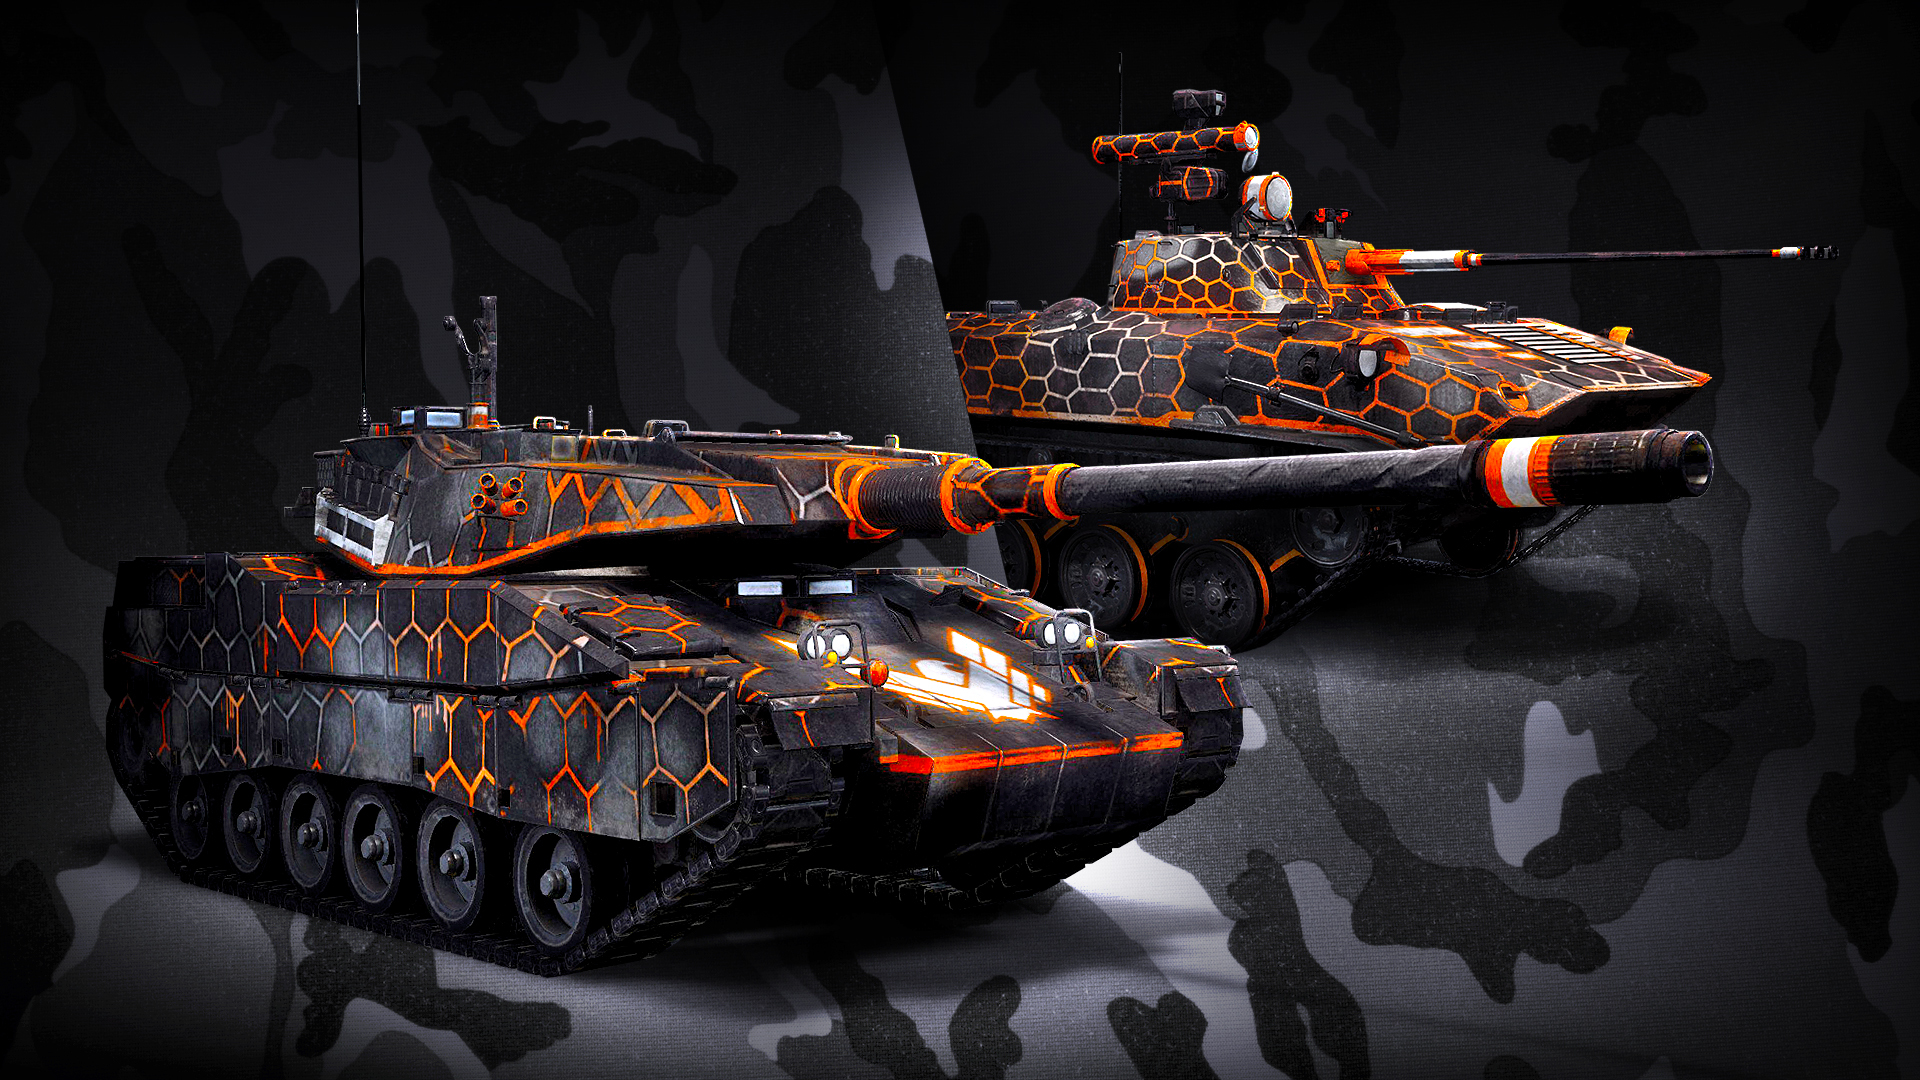 Dec 26, 2017 Introducing the Black Eagle Squad – Part 2 Armored